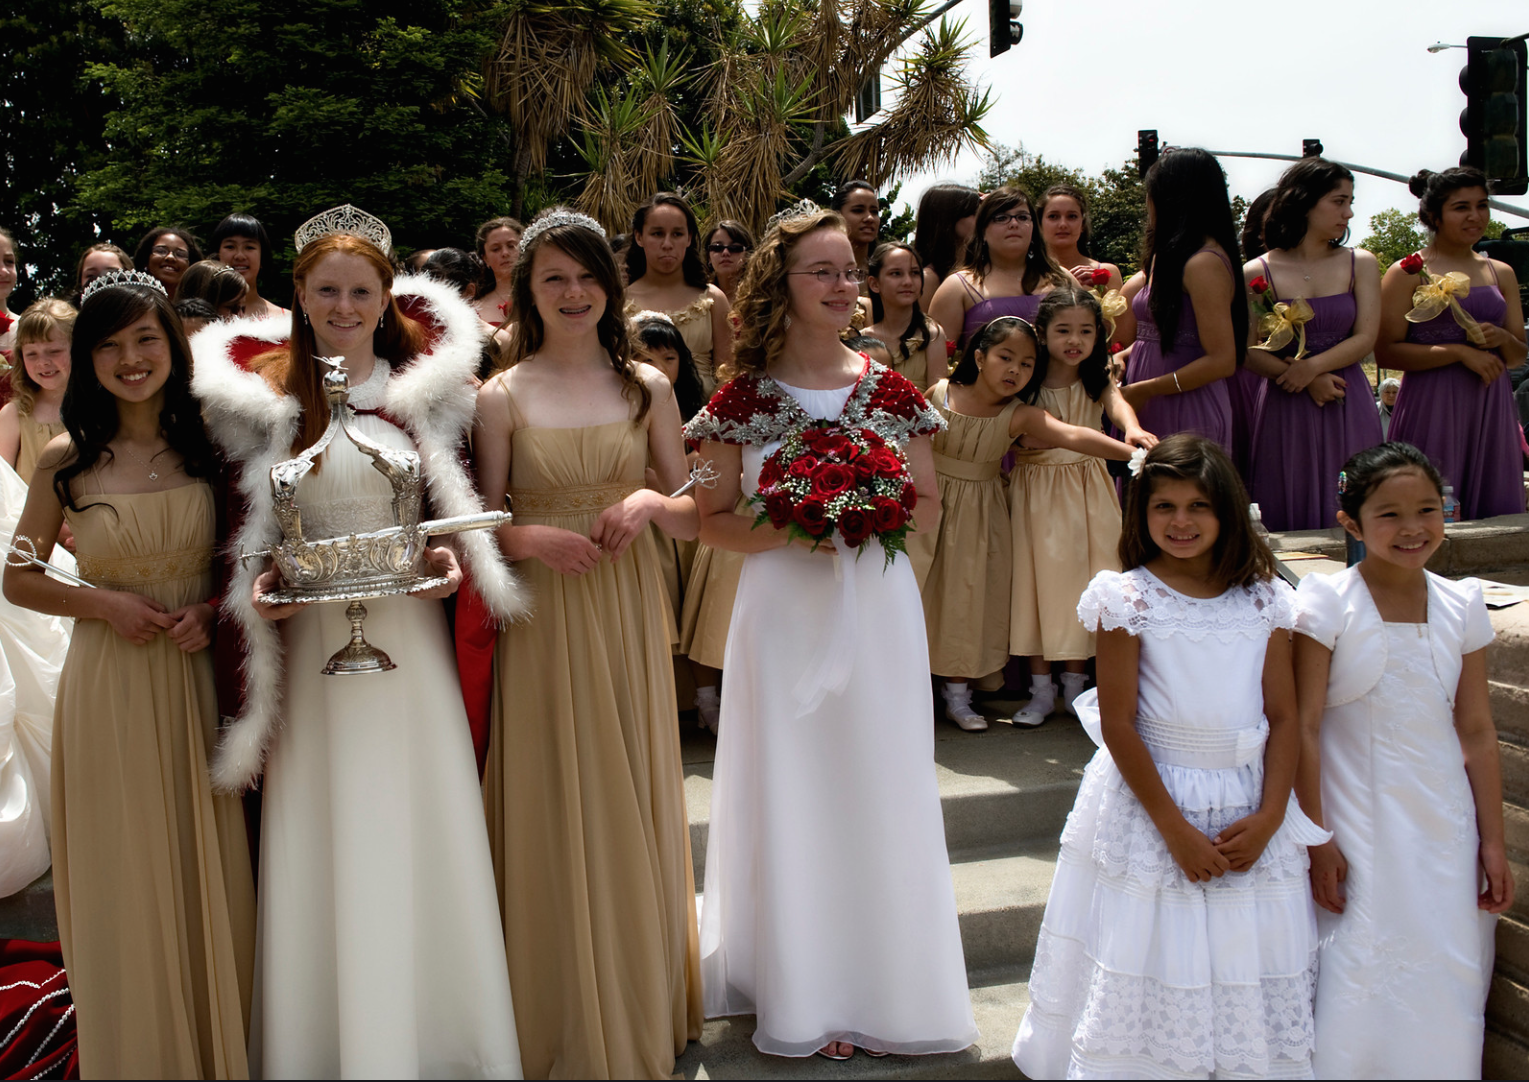 2011 Festival Queen - Katherine Bradshaw    Sidemaids  - Nicolette Gacusen & Rachel Adamson -  Honor Maid  - Kelsey Reynolds